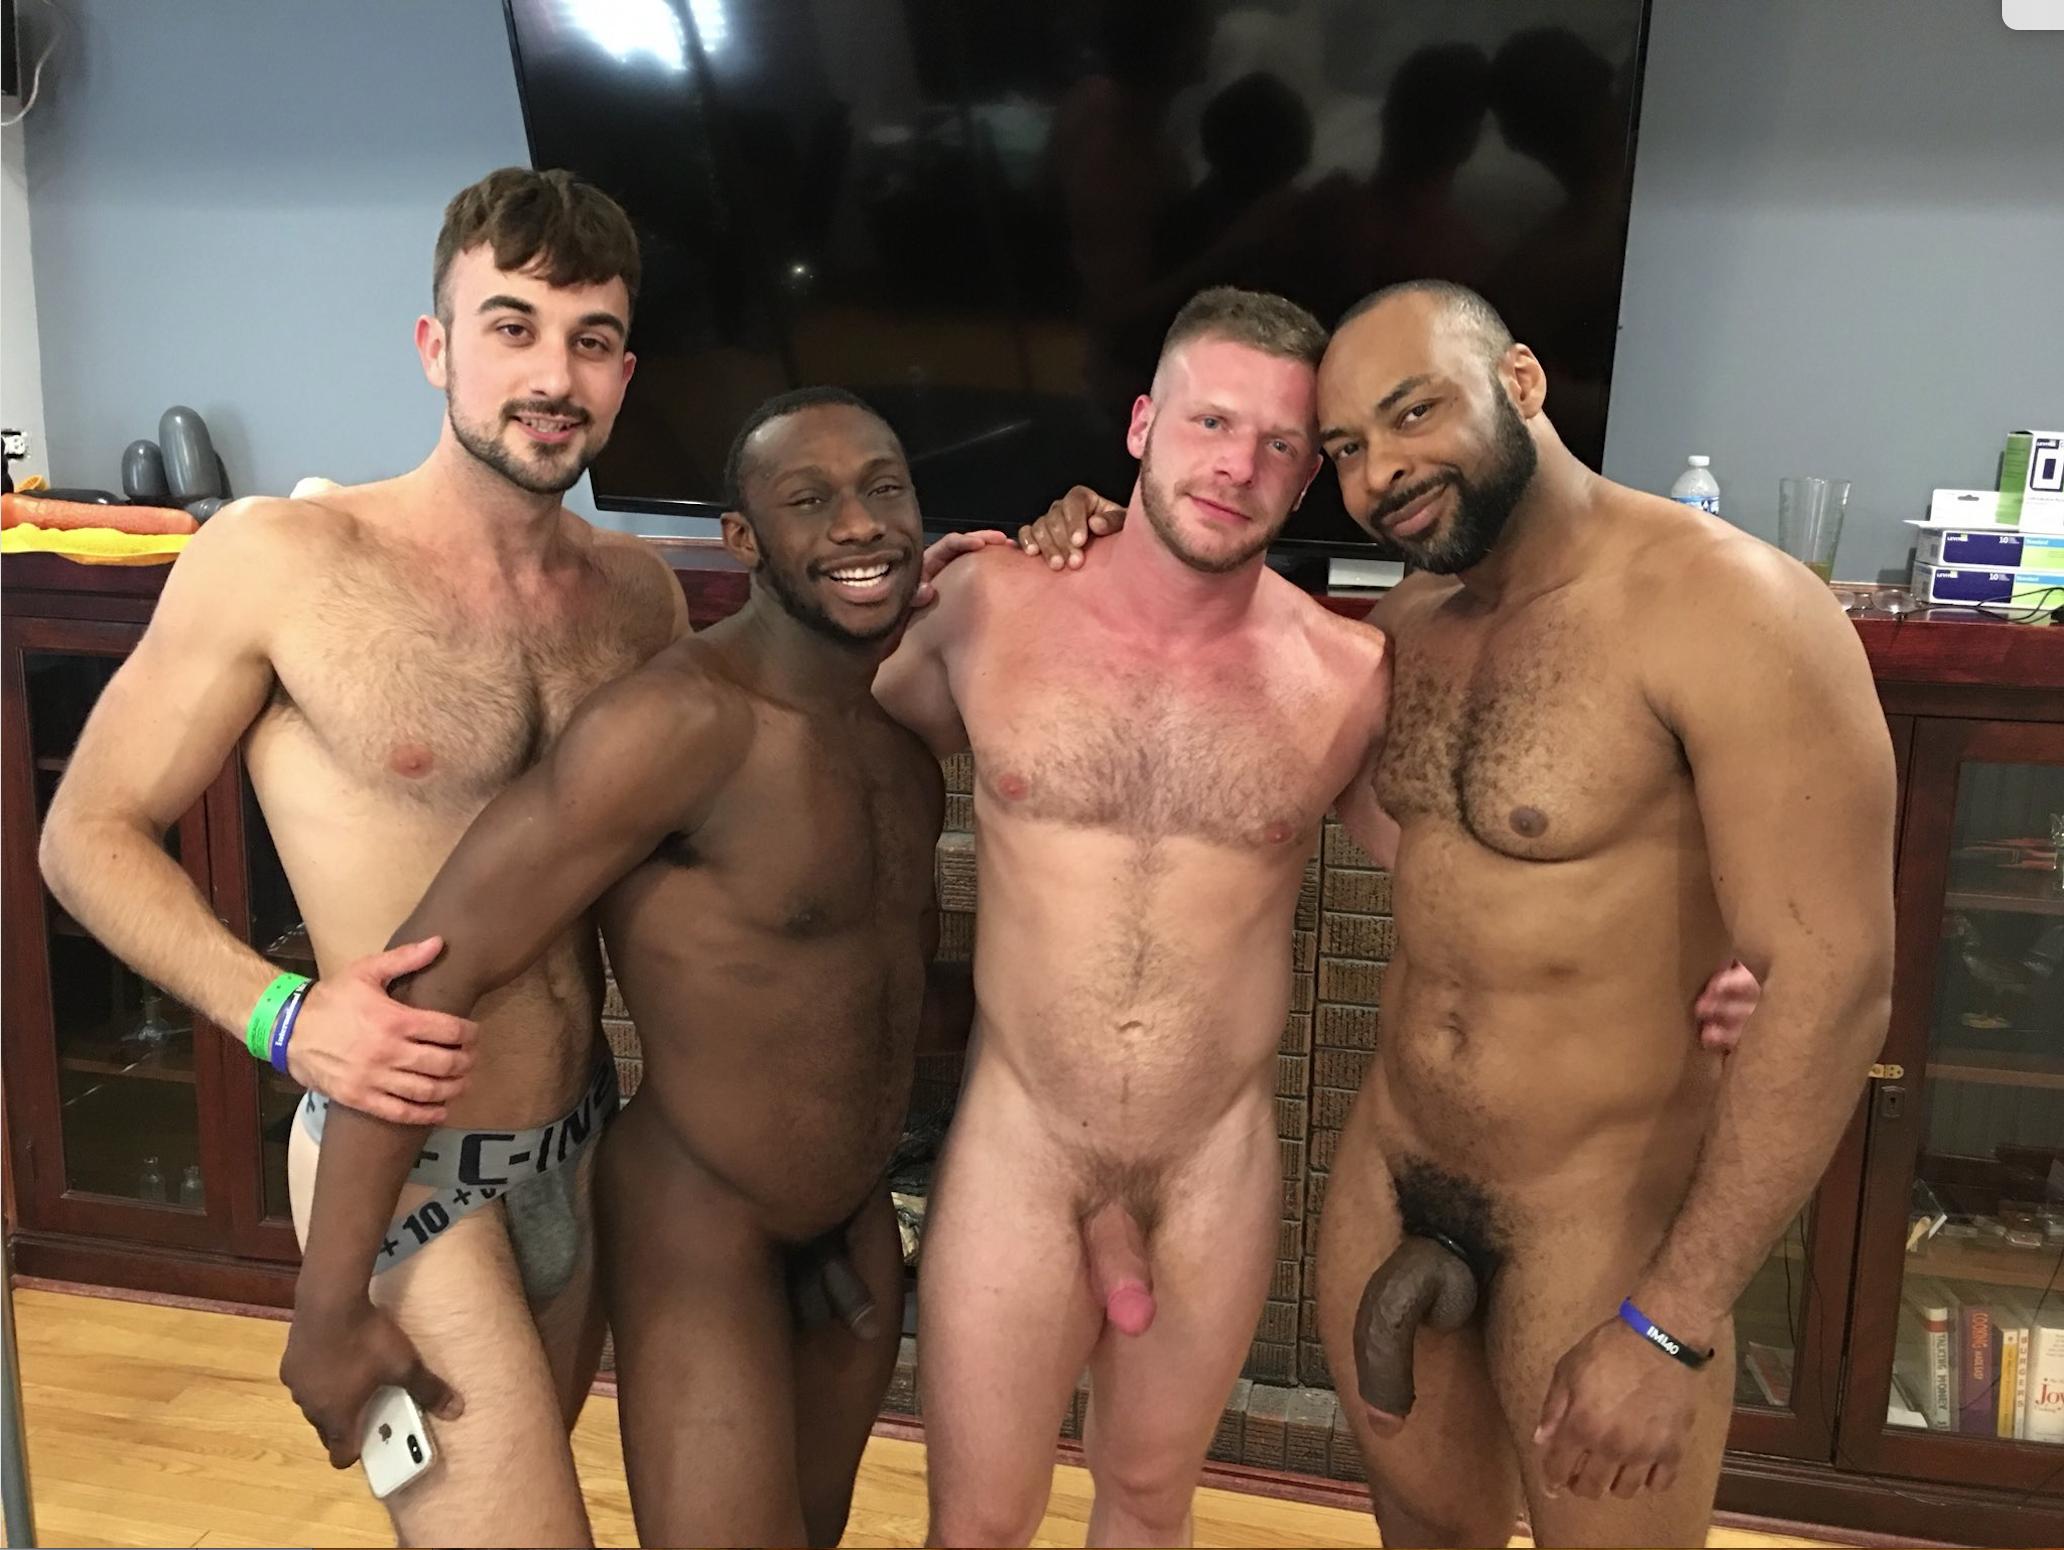 Resultado de imagem para RAY DIESEL, BRIAN BONDS, PARKER PAYNE & MASON LEAR porn